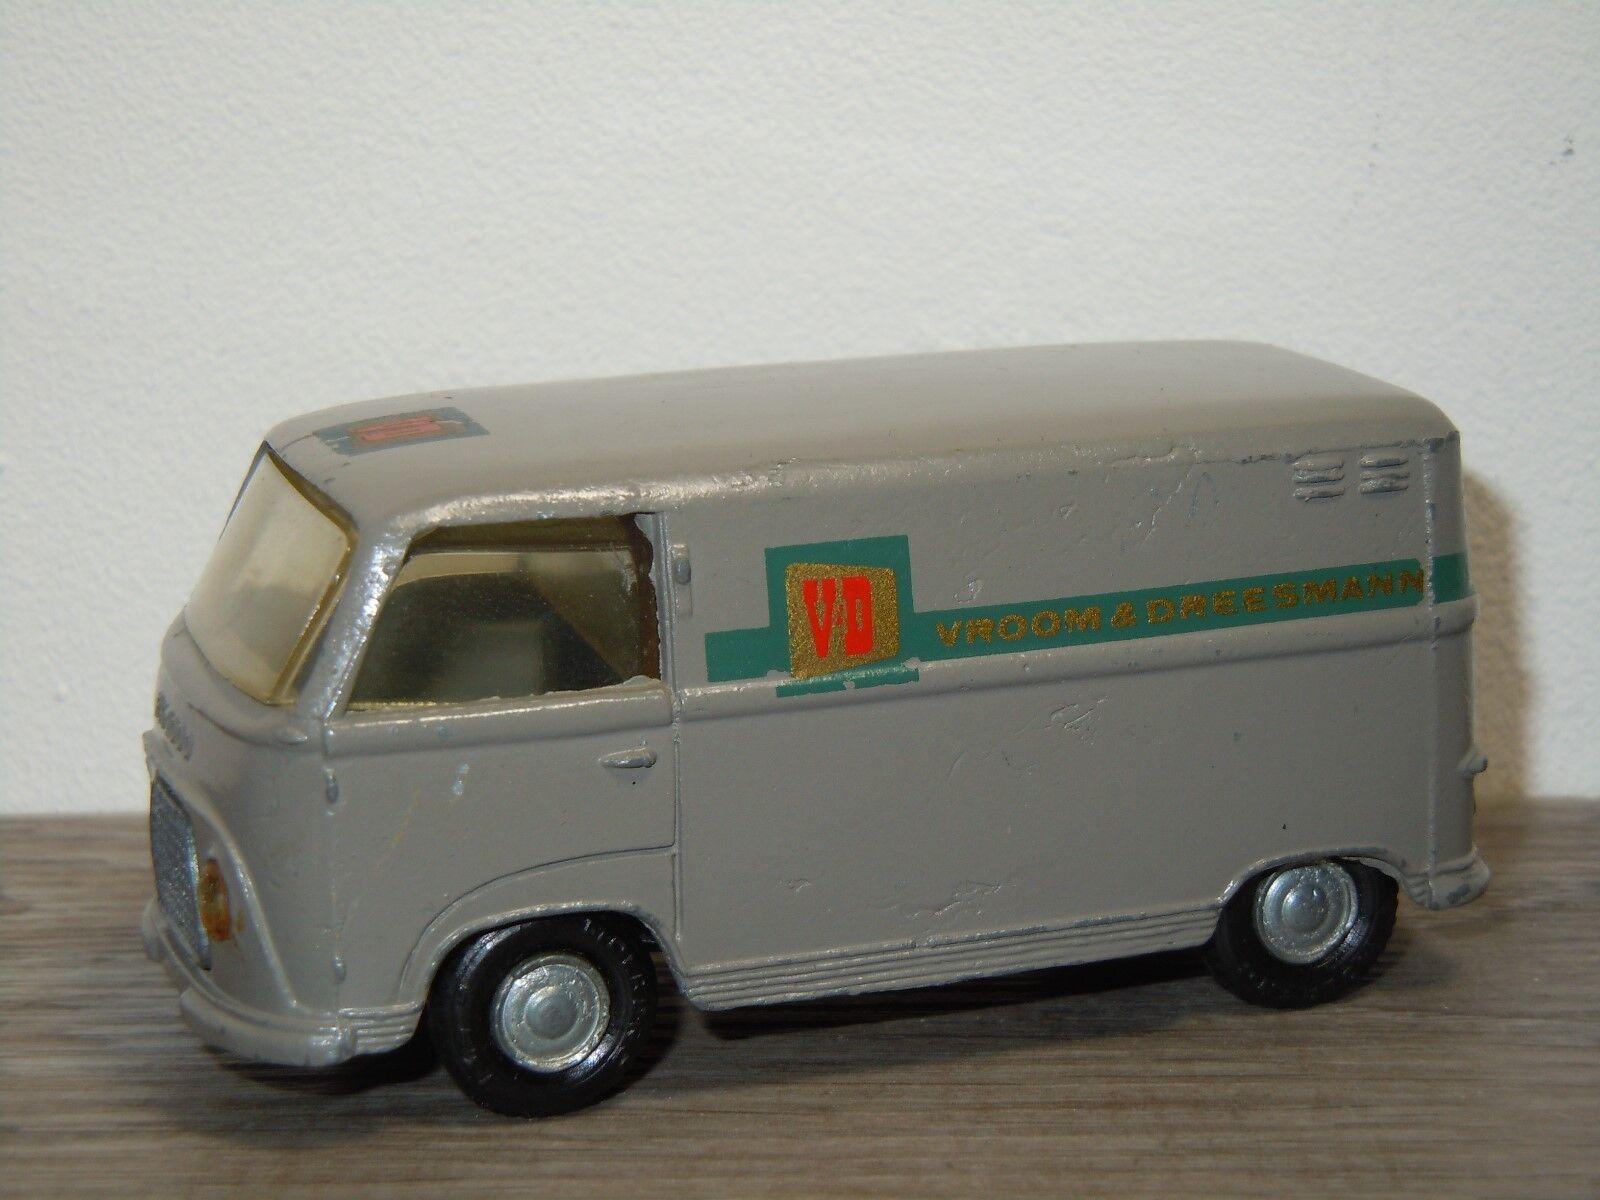 Ford Transit FK1000 V&D - Lion Car Tekno Denmark - Rare Dutch Special 32458